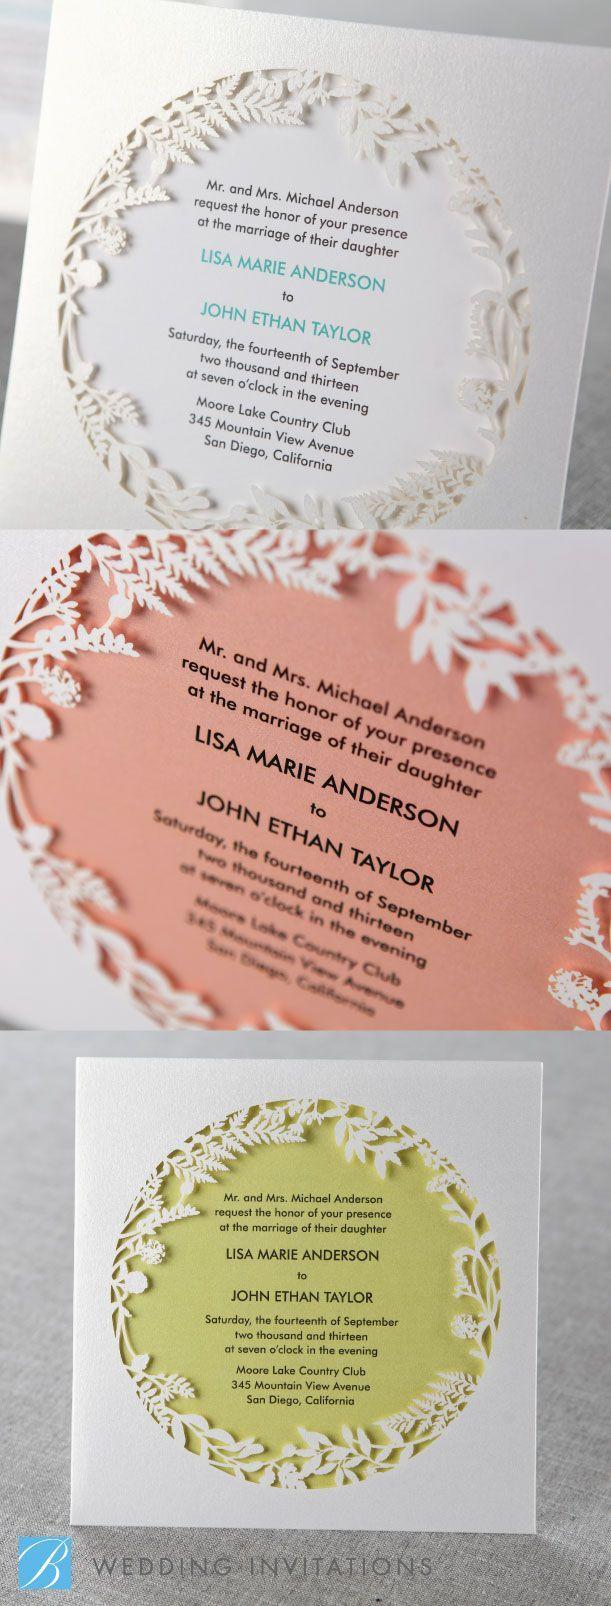 Enchanted Forest 1 Laser Cut P by B Wedding Invitations